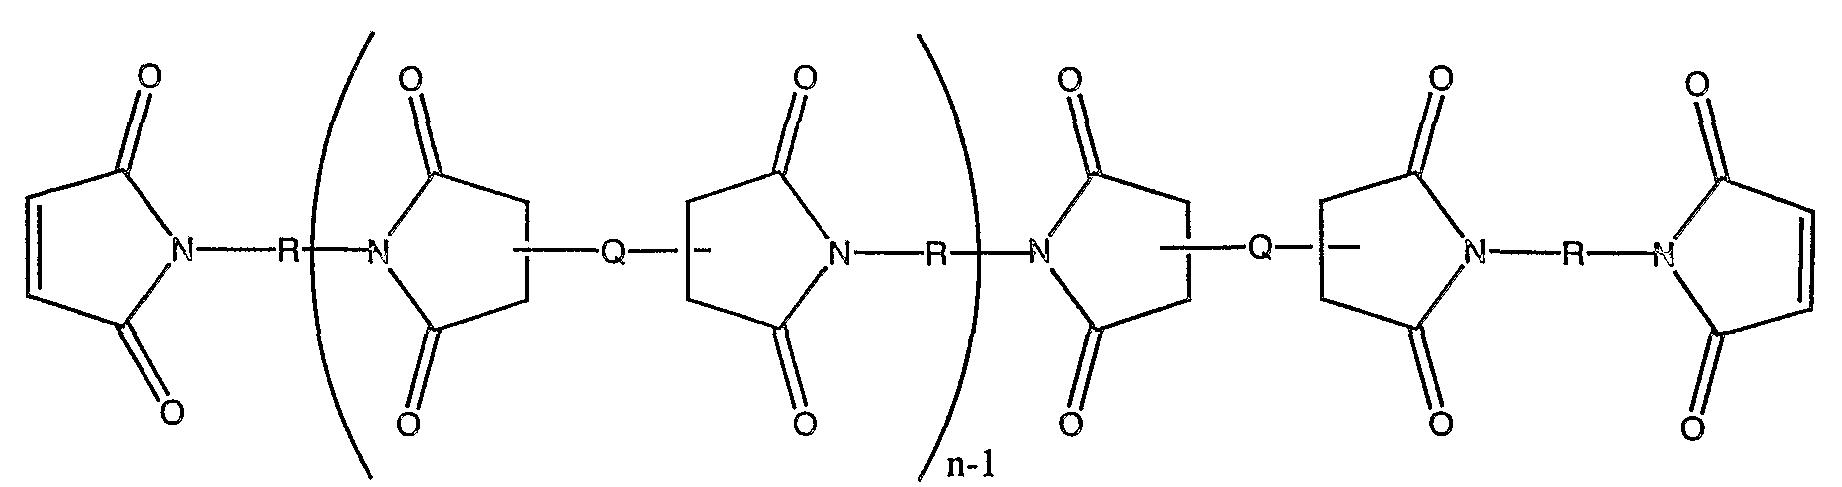 Figure 712012001435804-pct00021